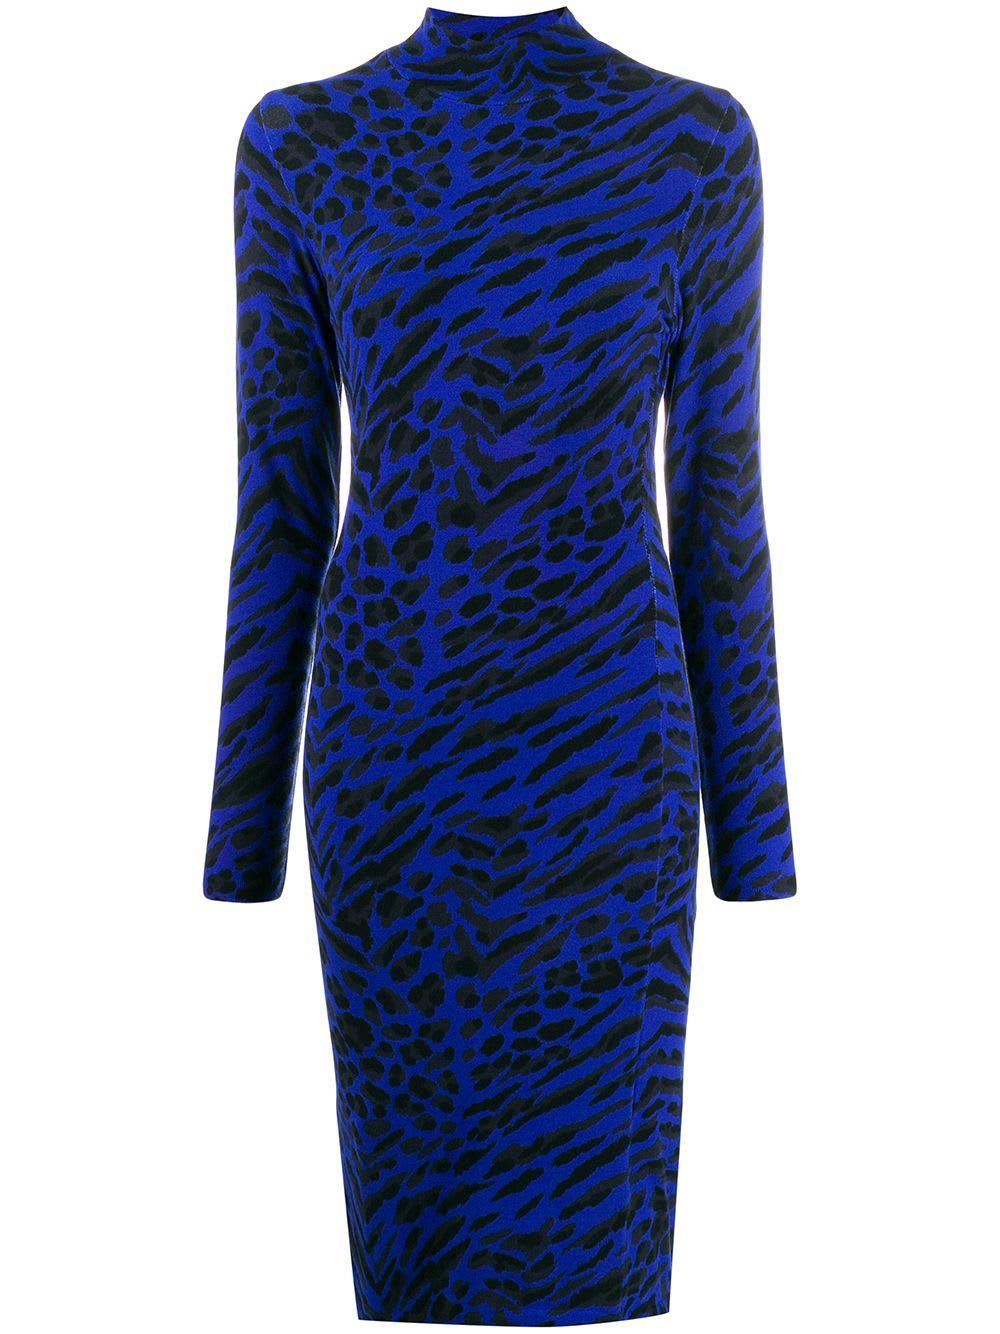 Blumarine Printed Animalier Dress